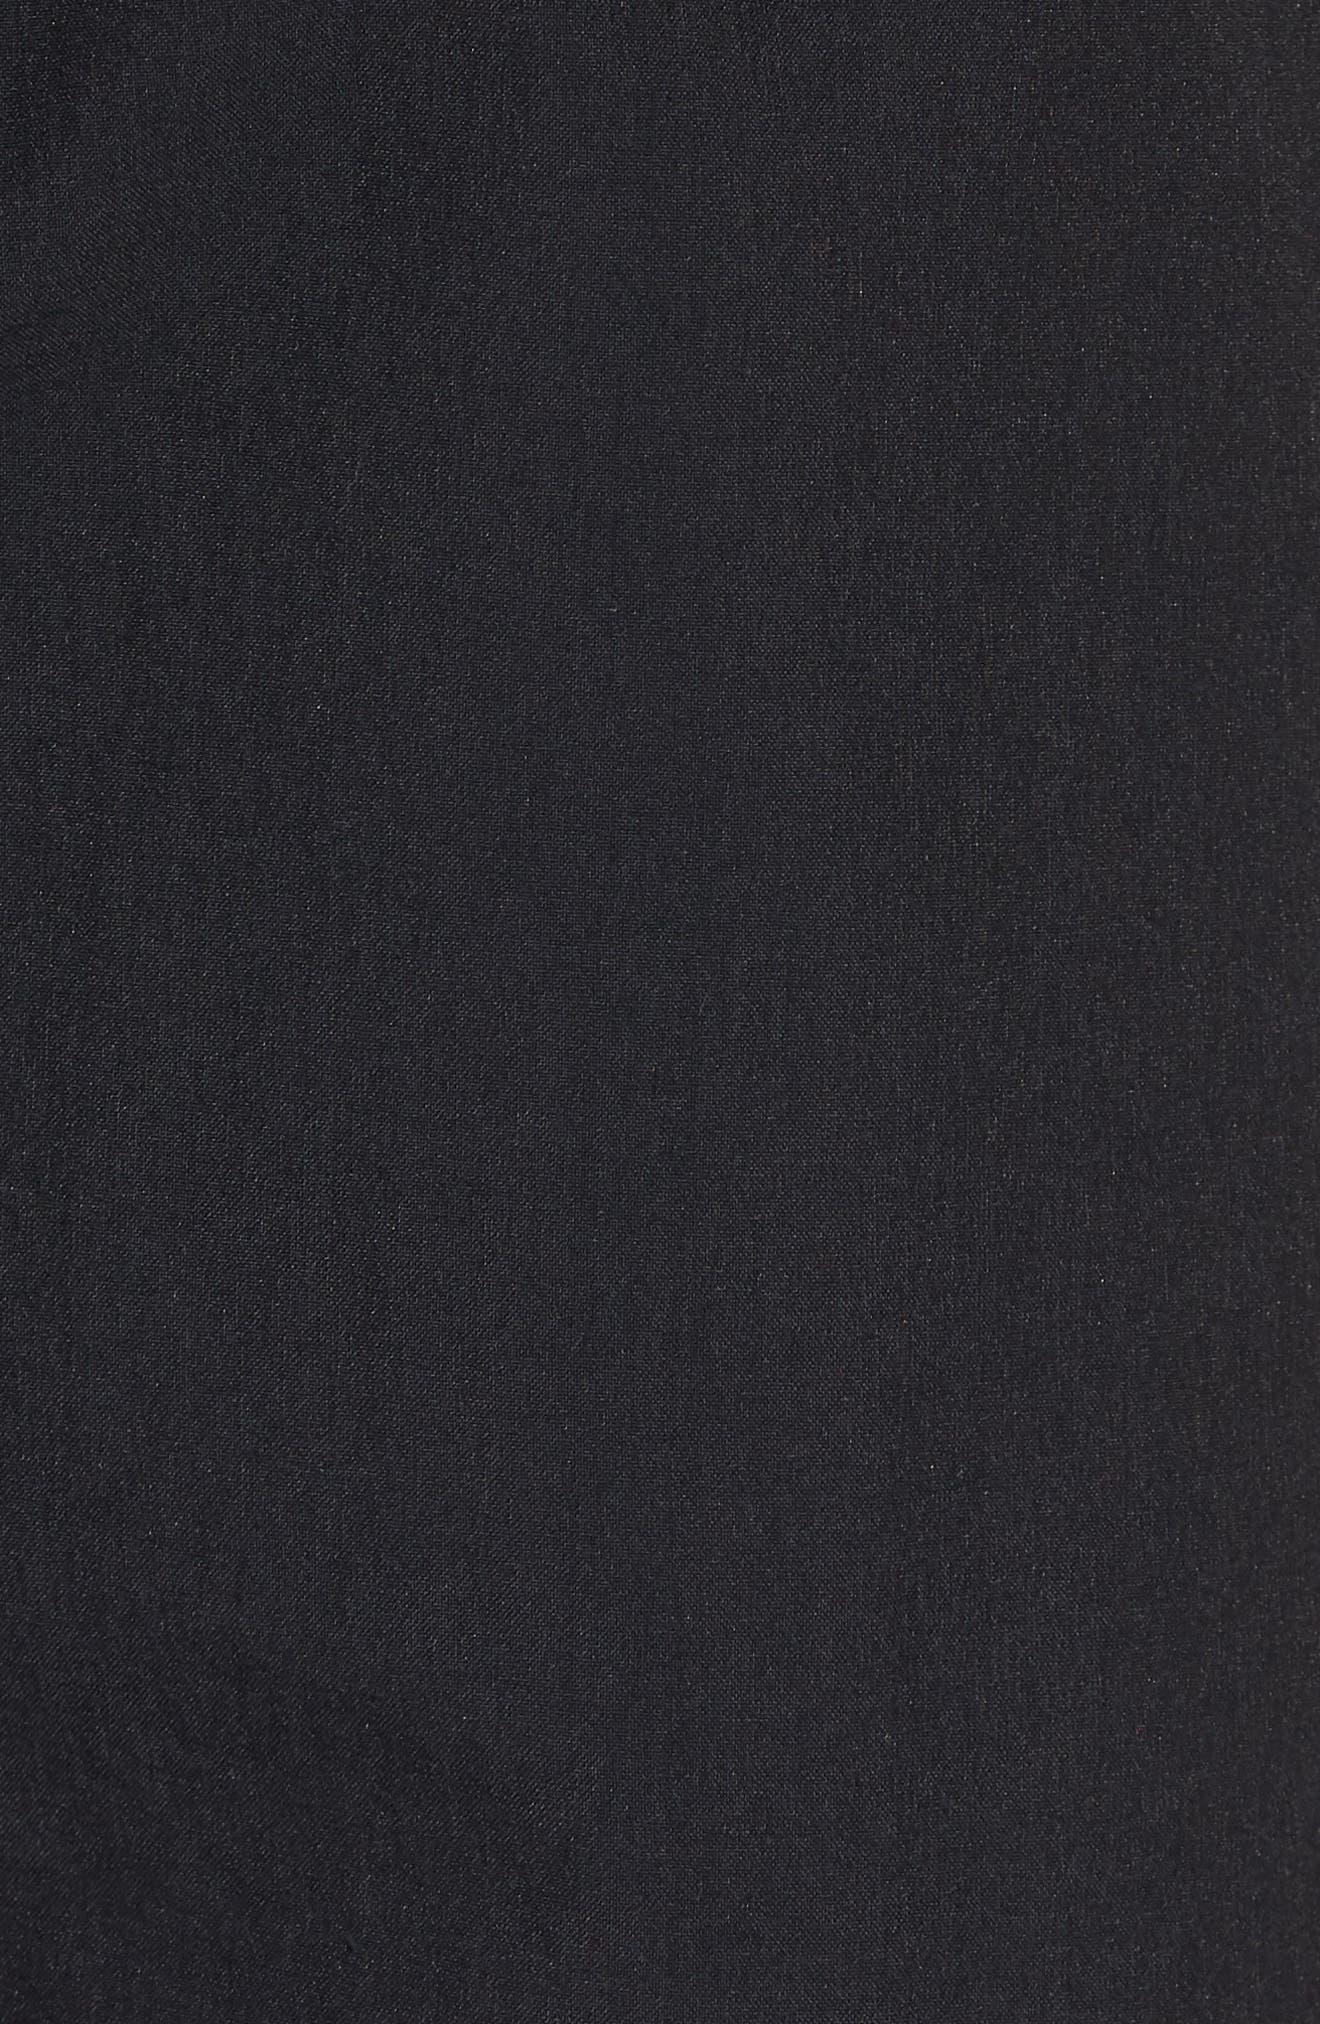 Sportswear Woven Shorts,                             Alternate thumbnail 5, color,                             Black/ Black